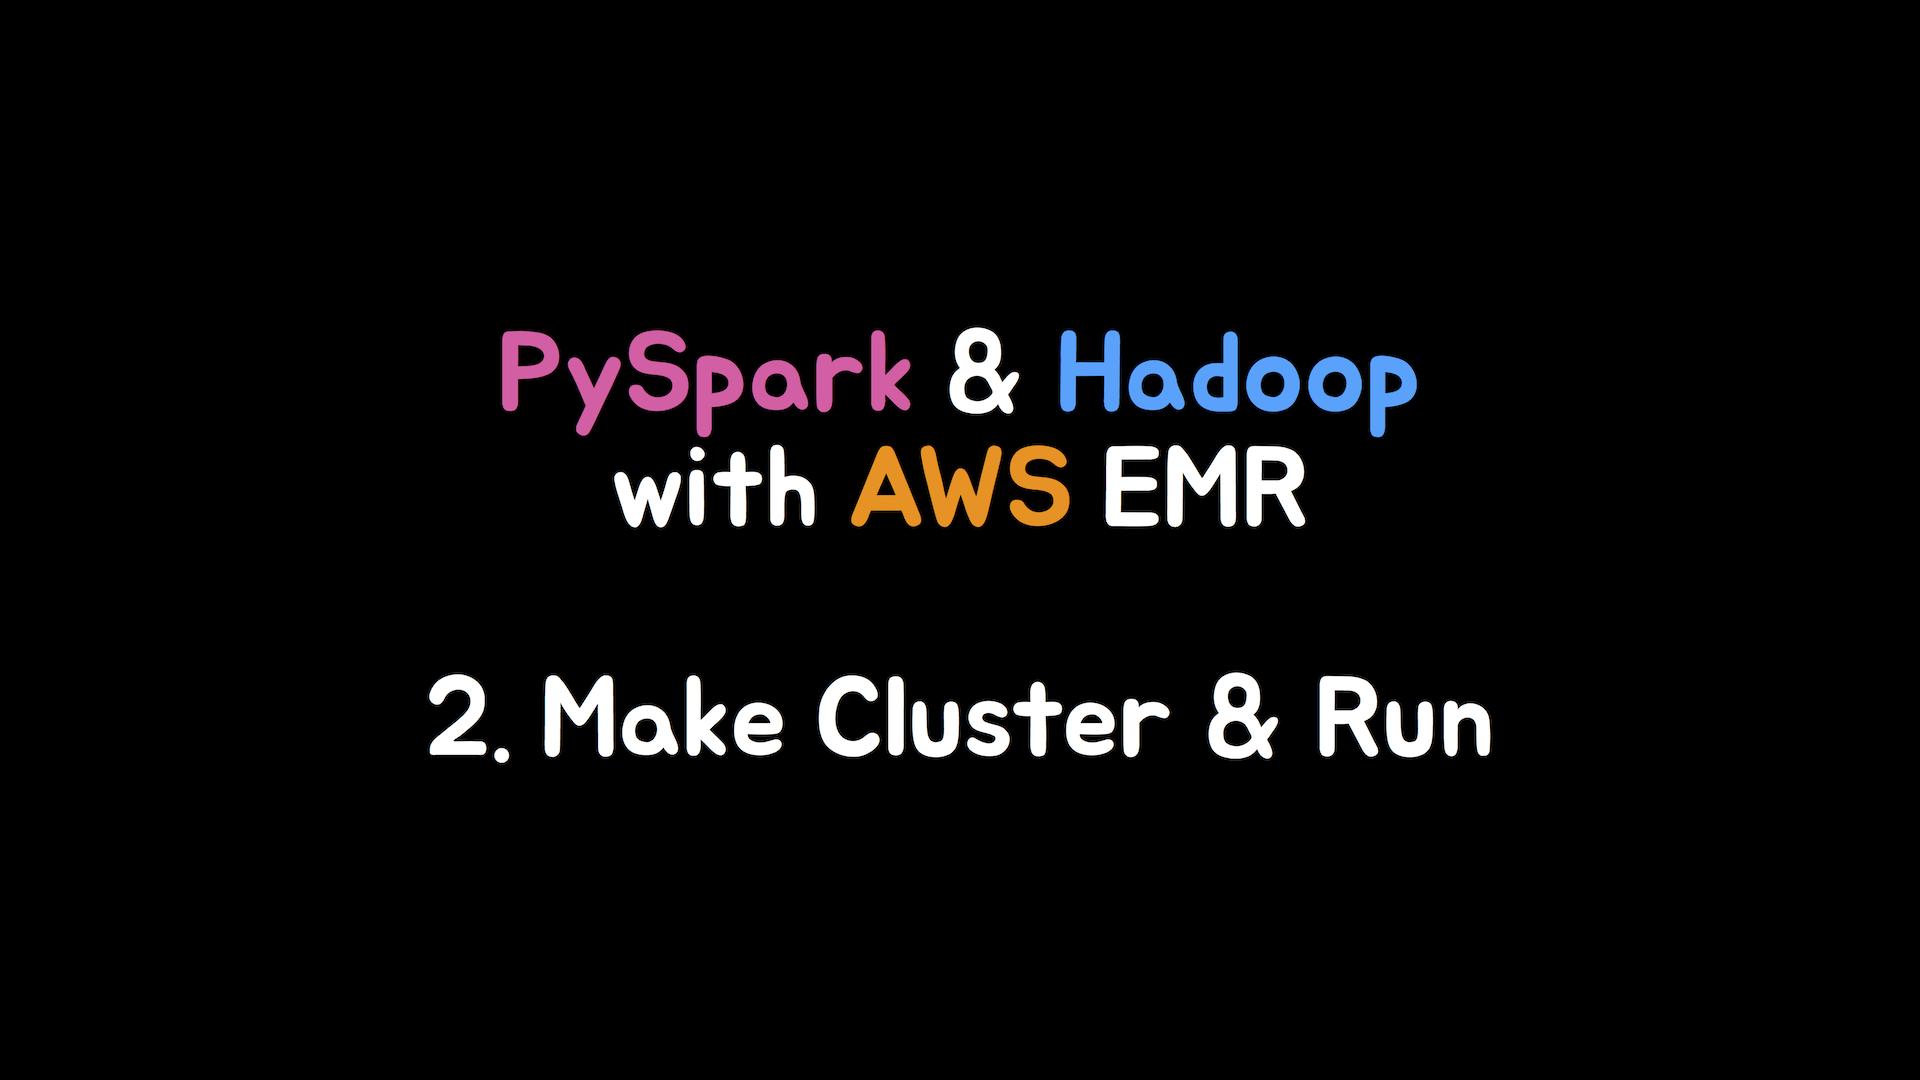 PySpark & Hadoop: 2) EMR 클러스터 띄우고 PySpark로 작업 던지기